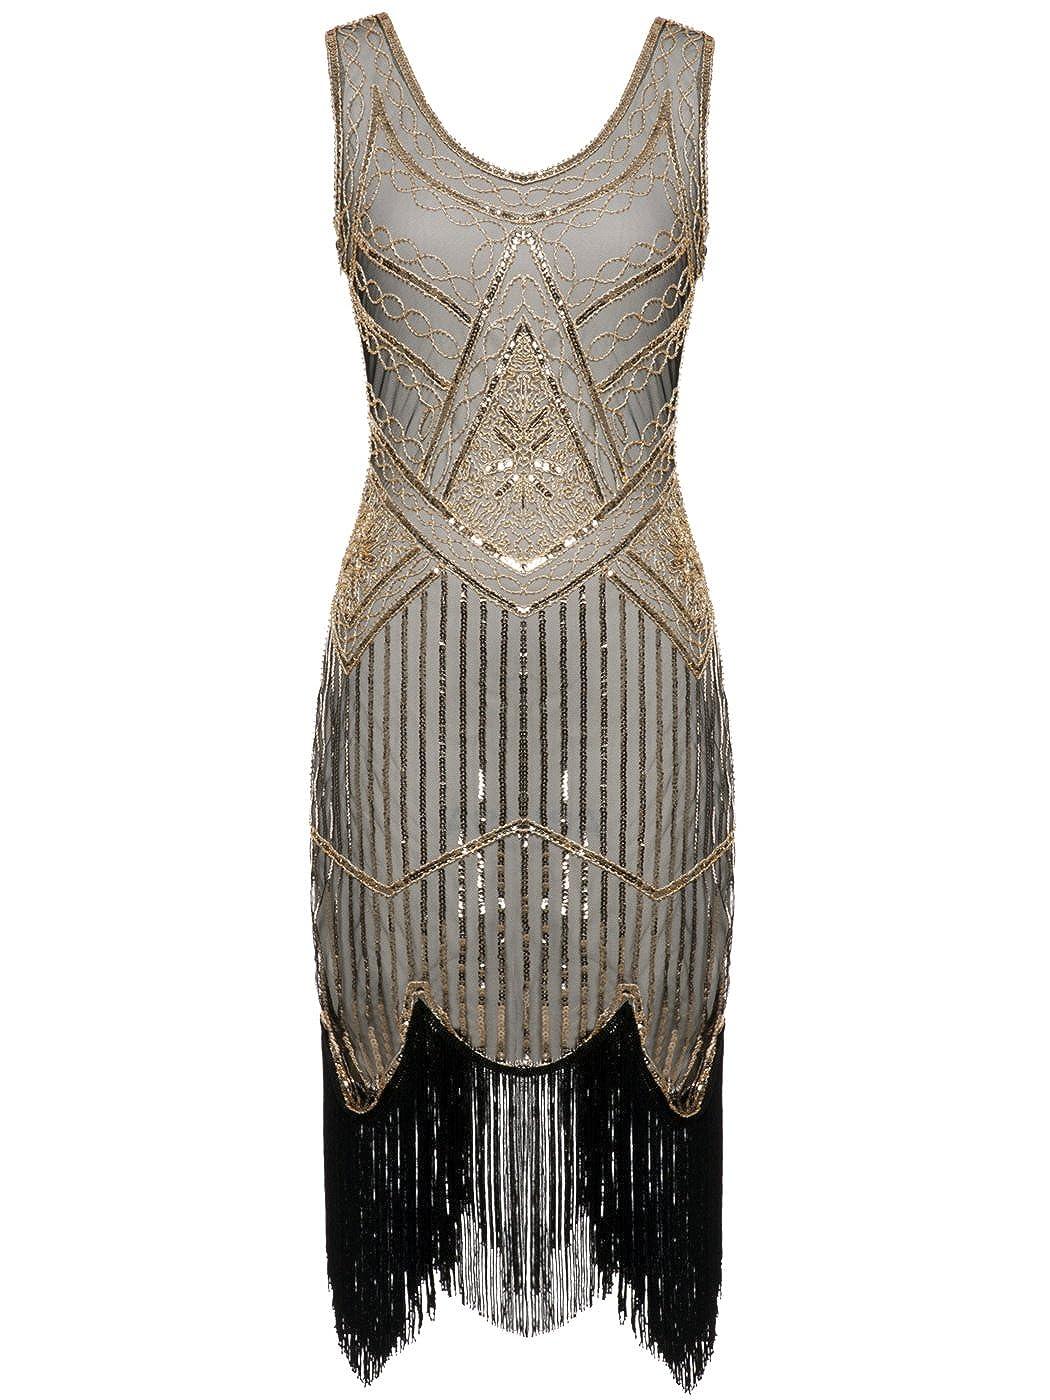 FAIRY COUPLE 1920S Sequined Beaded Tassels Hem Gatsby Flapper Dress D20S001